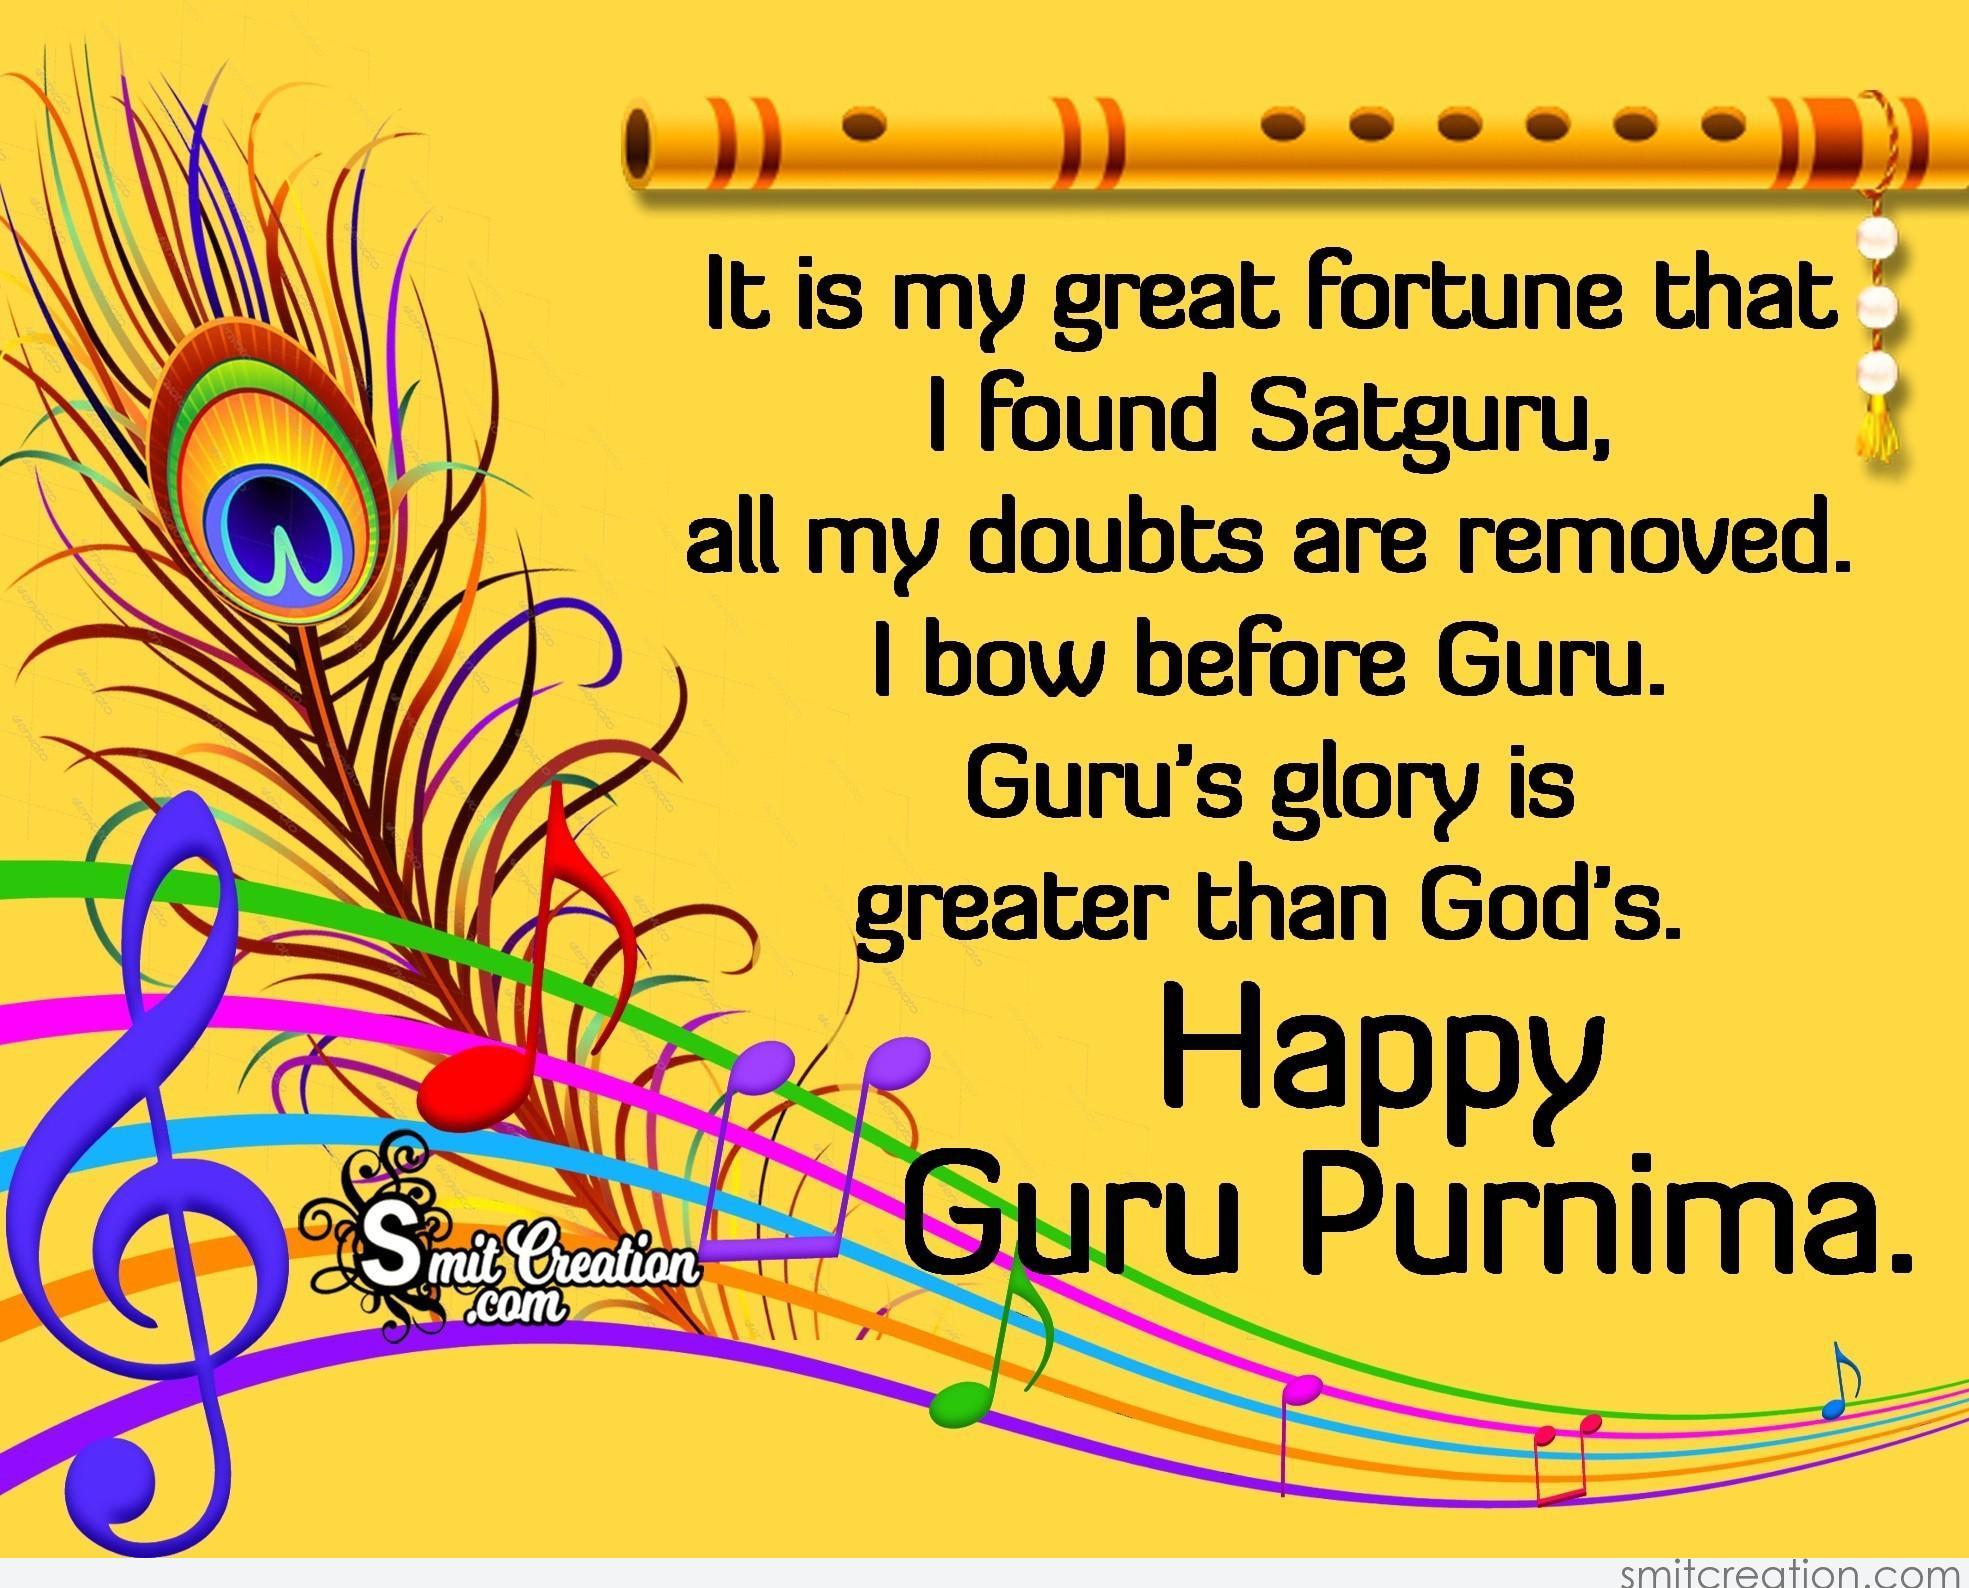 Guru Purnima Pictures and Graphics - SmitCreation.com